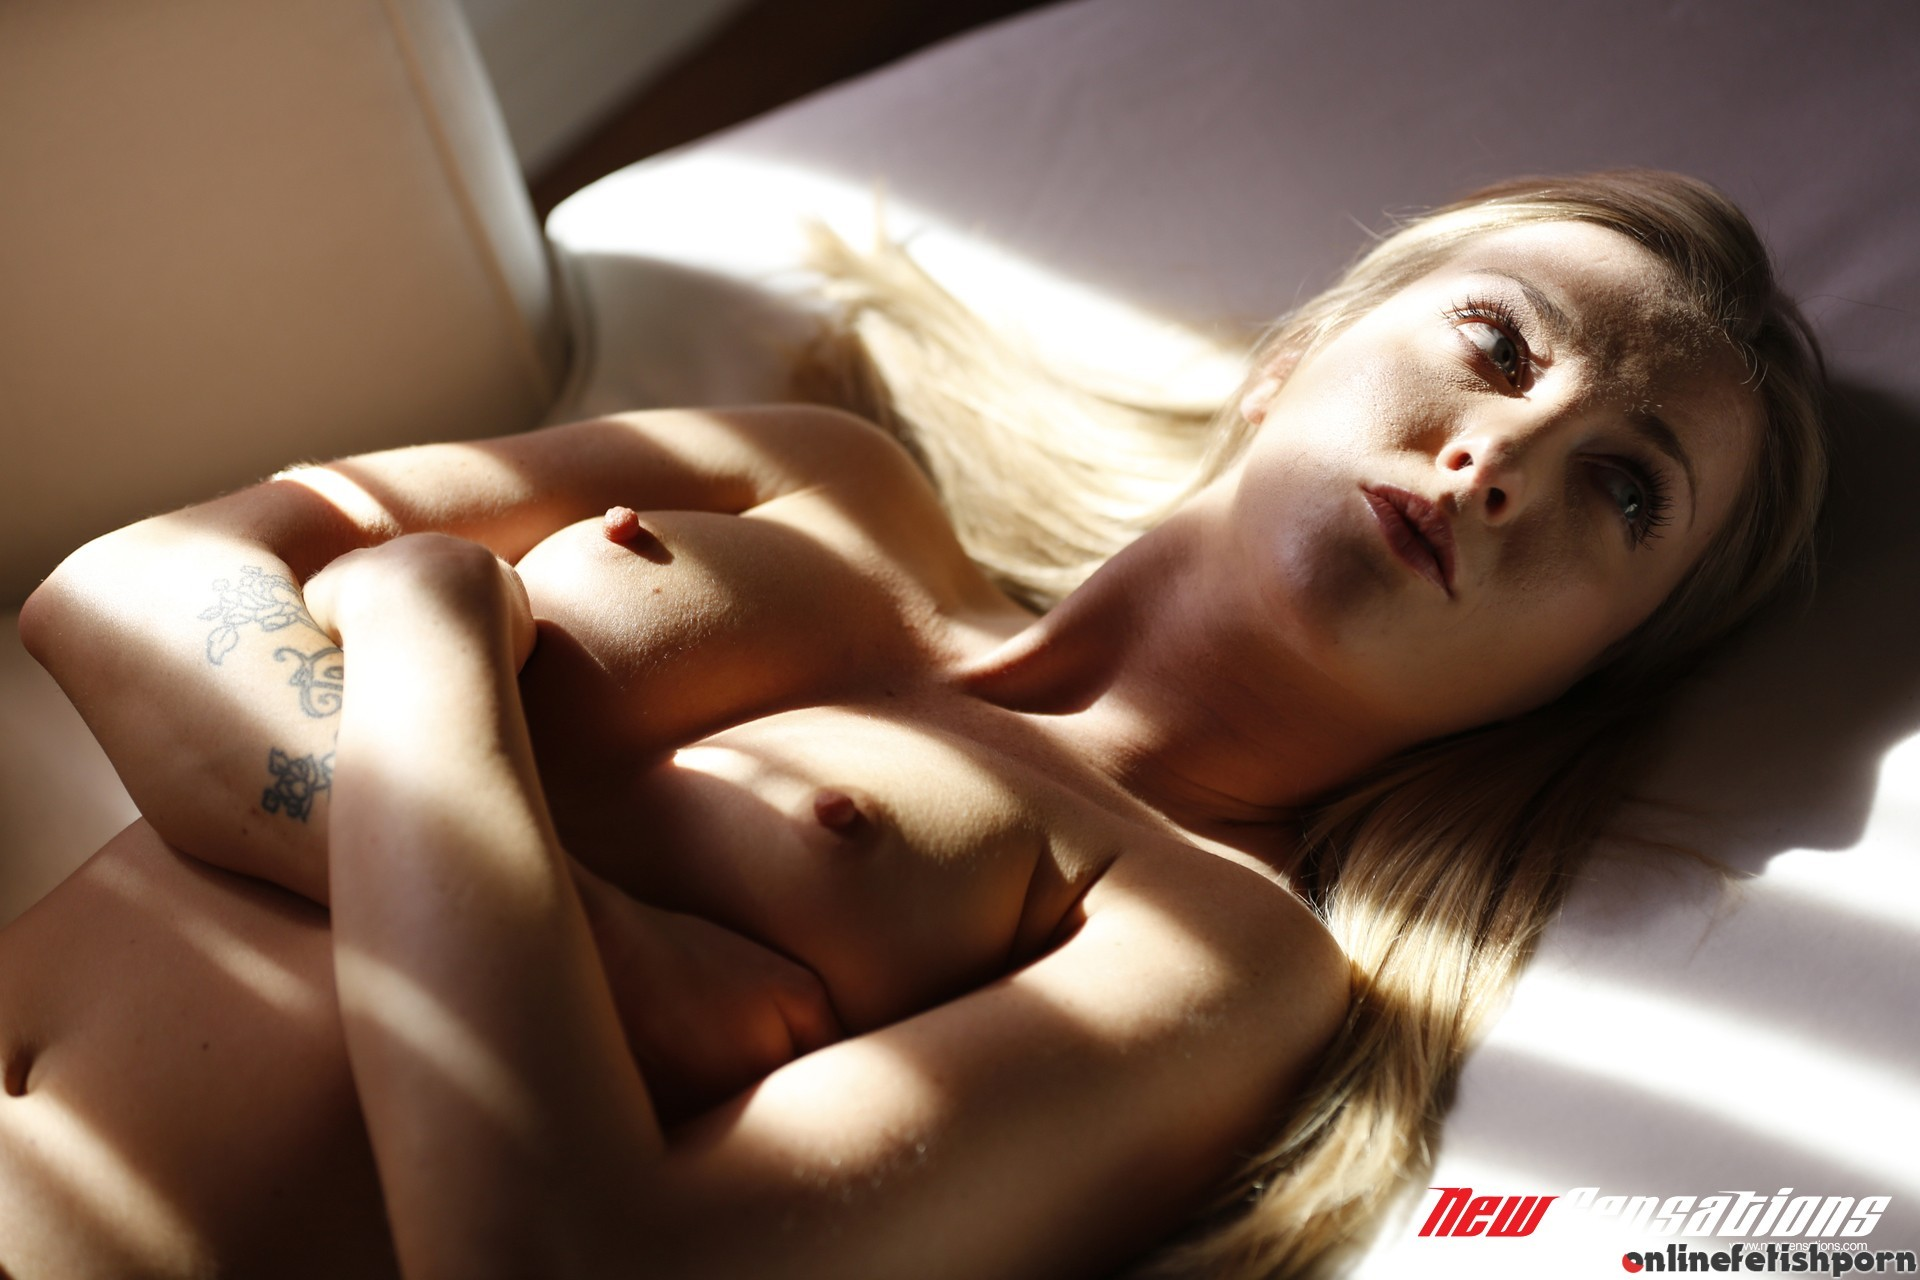 Nadia Styles Donna Dana Dearmond Porn fuckingmachines – the angels meet their match in.. nadia